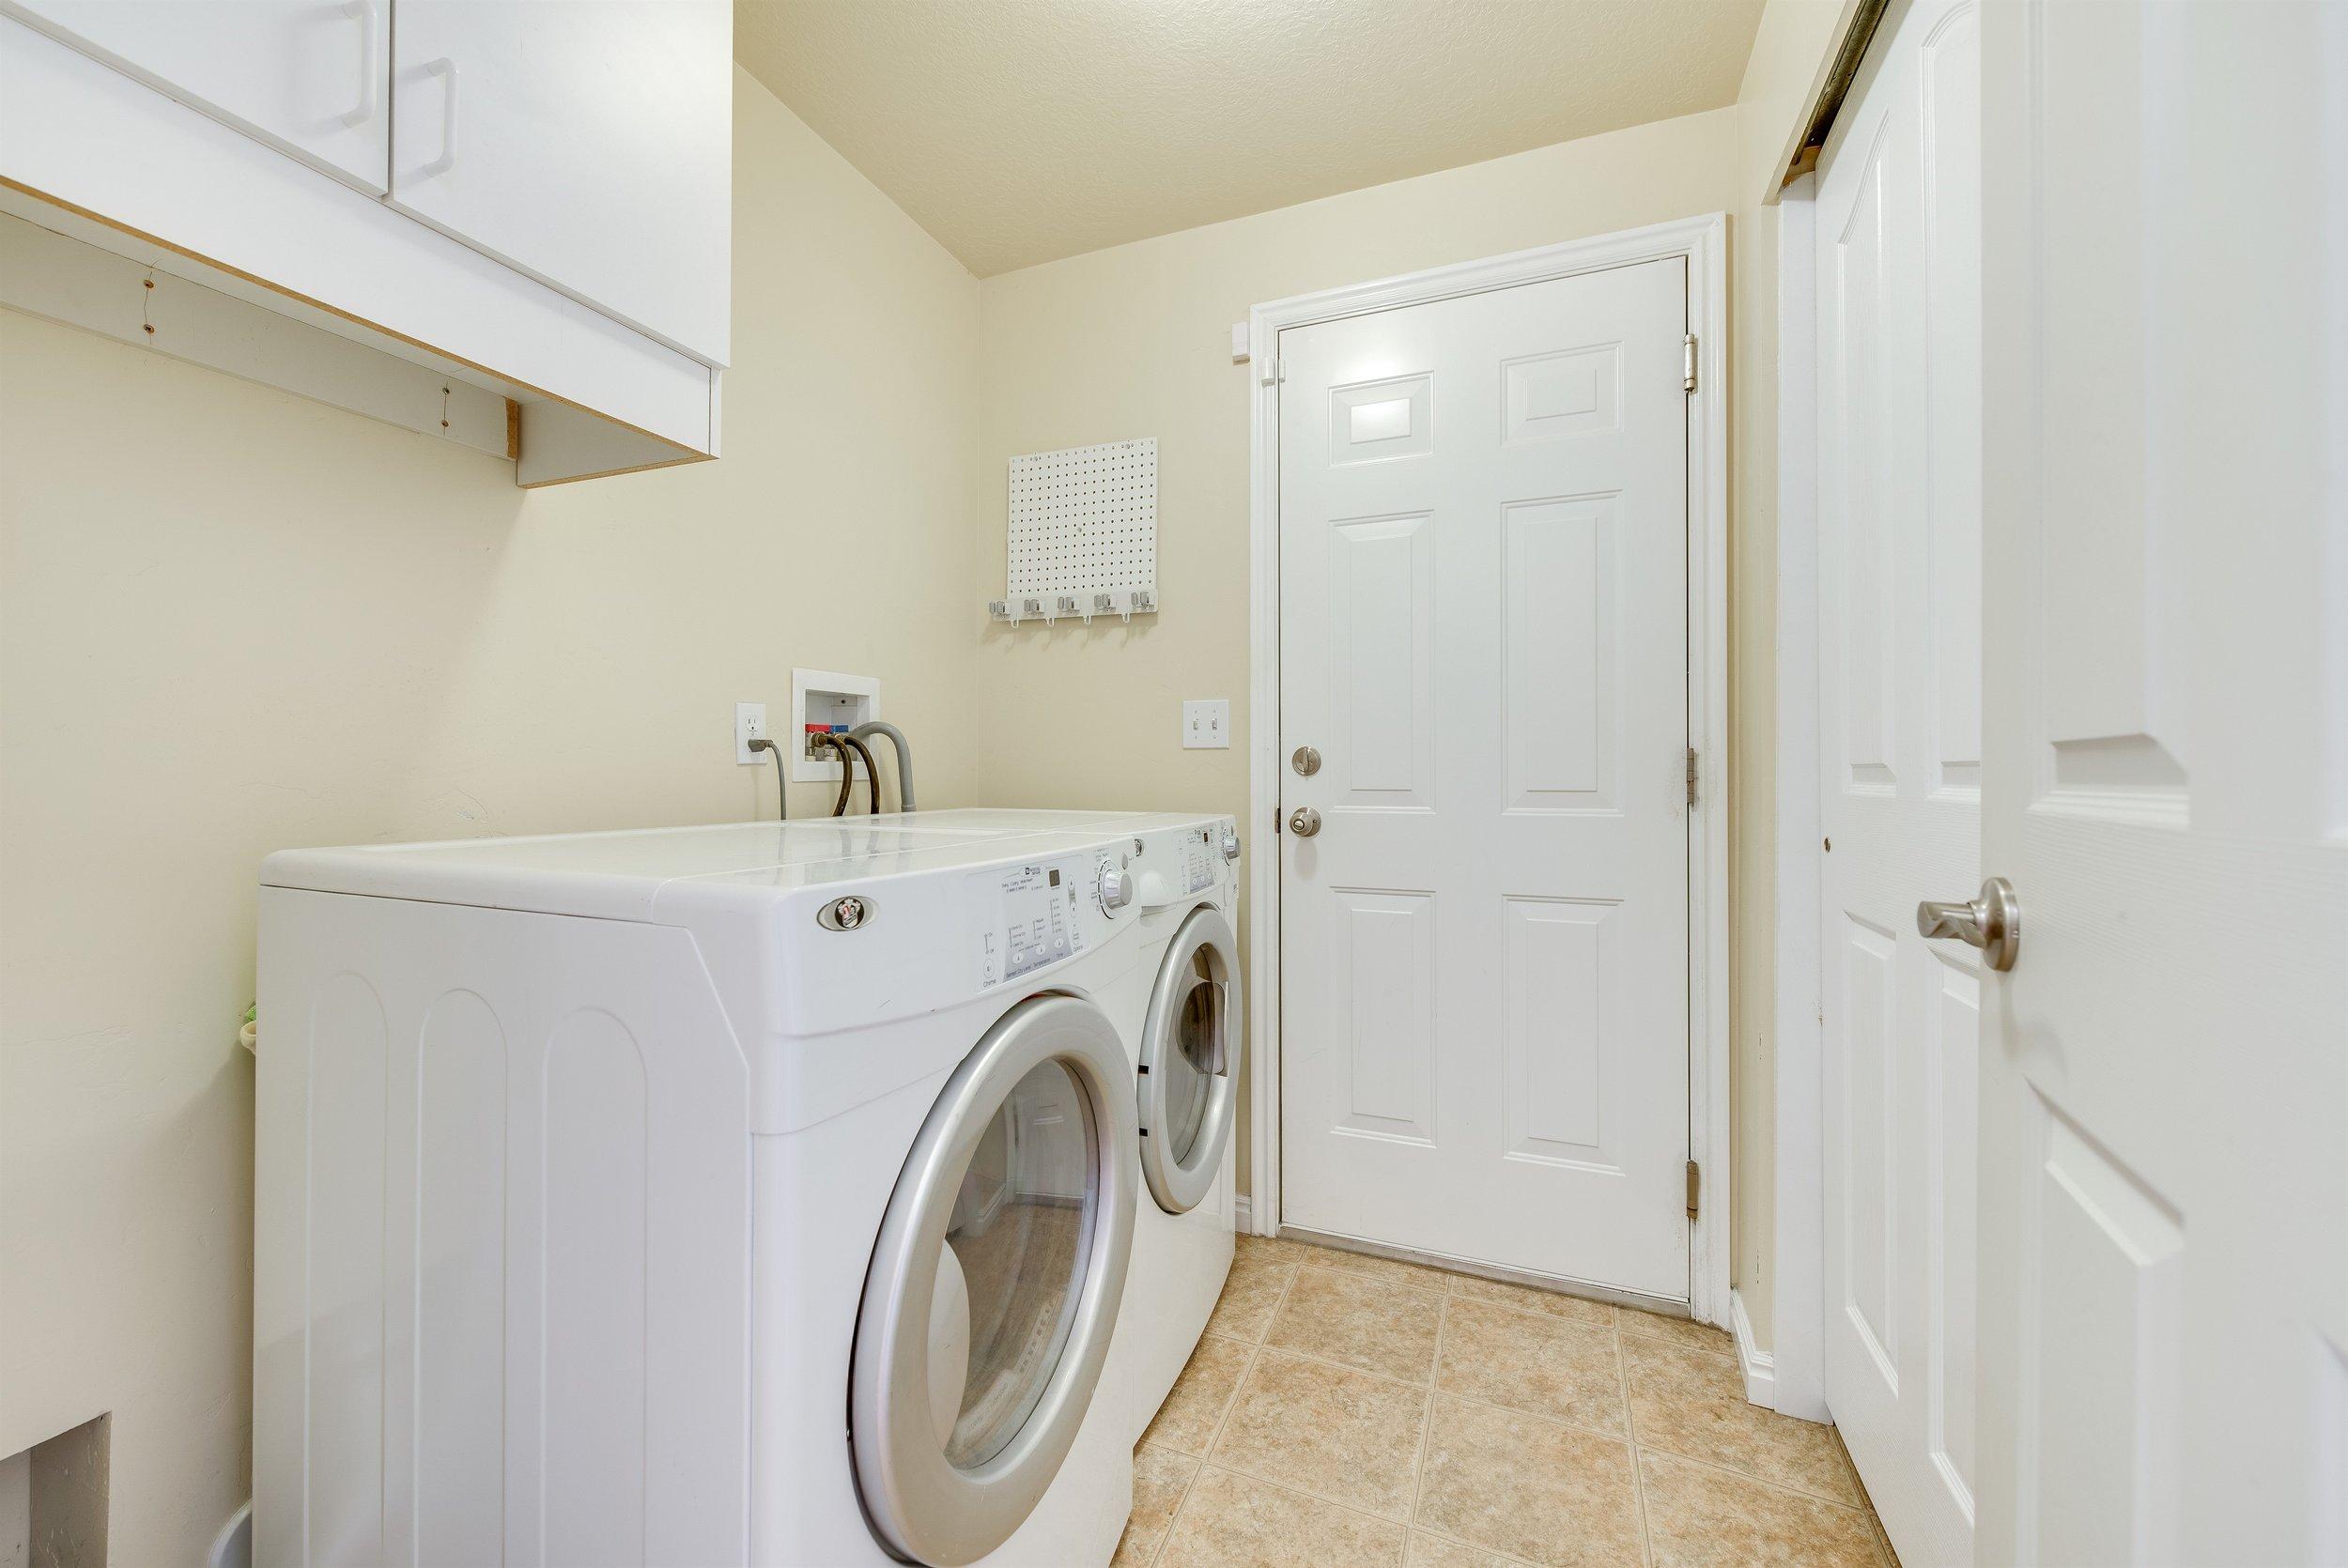 010_Laundry.jpg